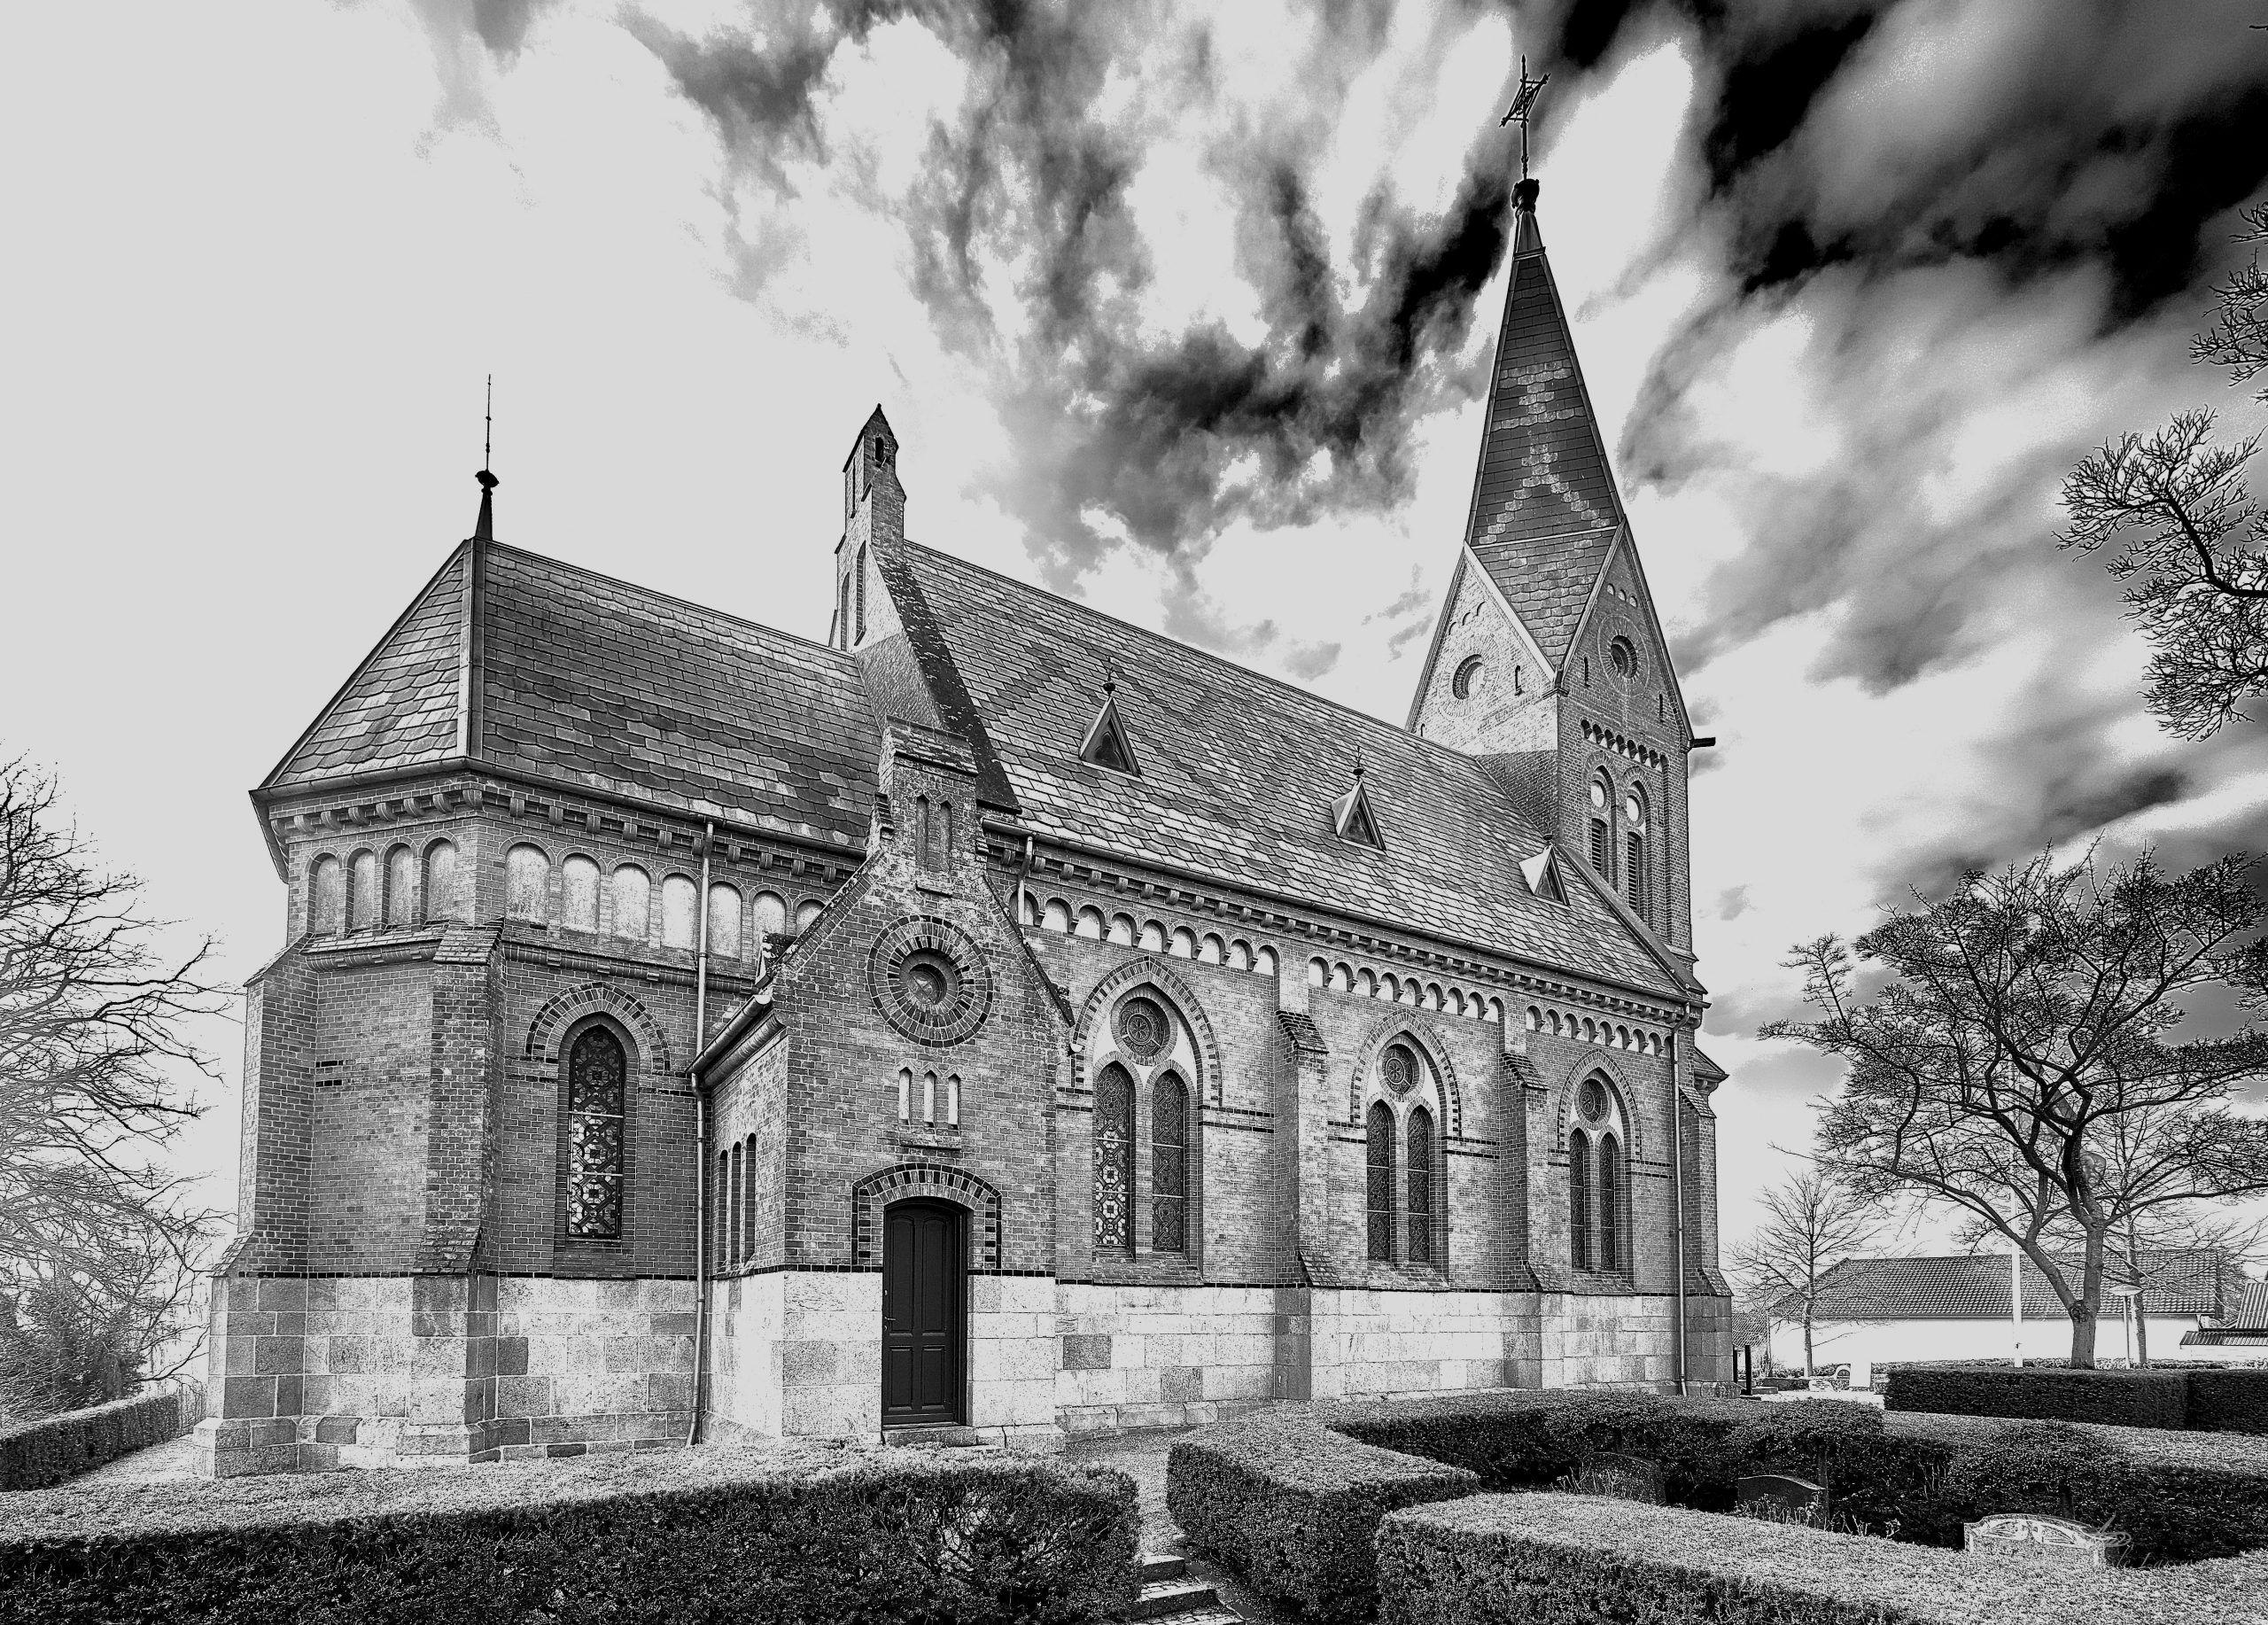 Landsbykatedralen, Kontur, Uge 8, 51/365, Storring Kirke, Galten